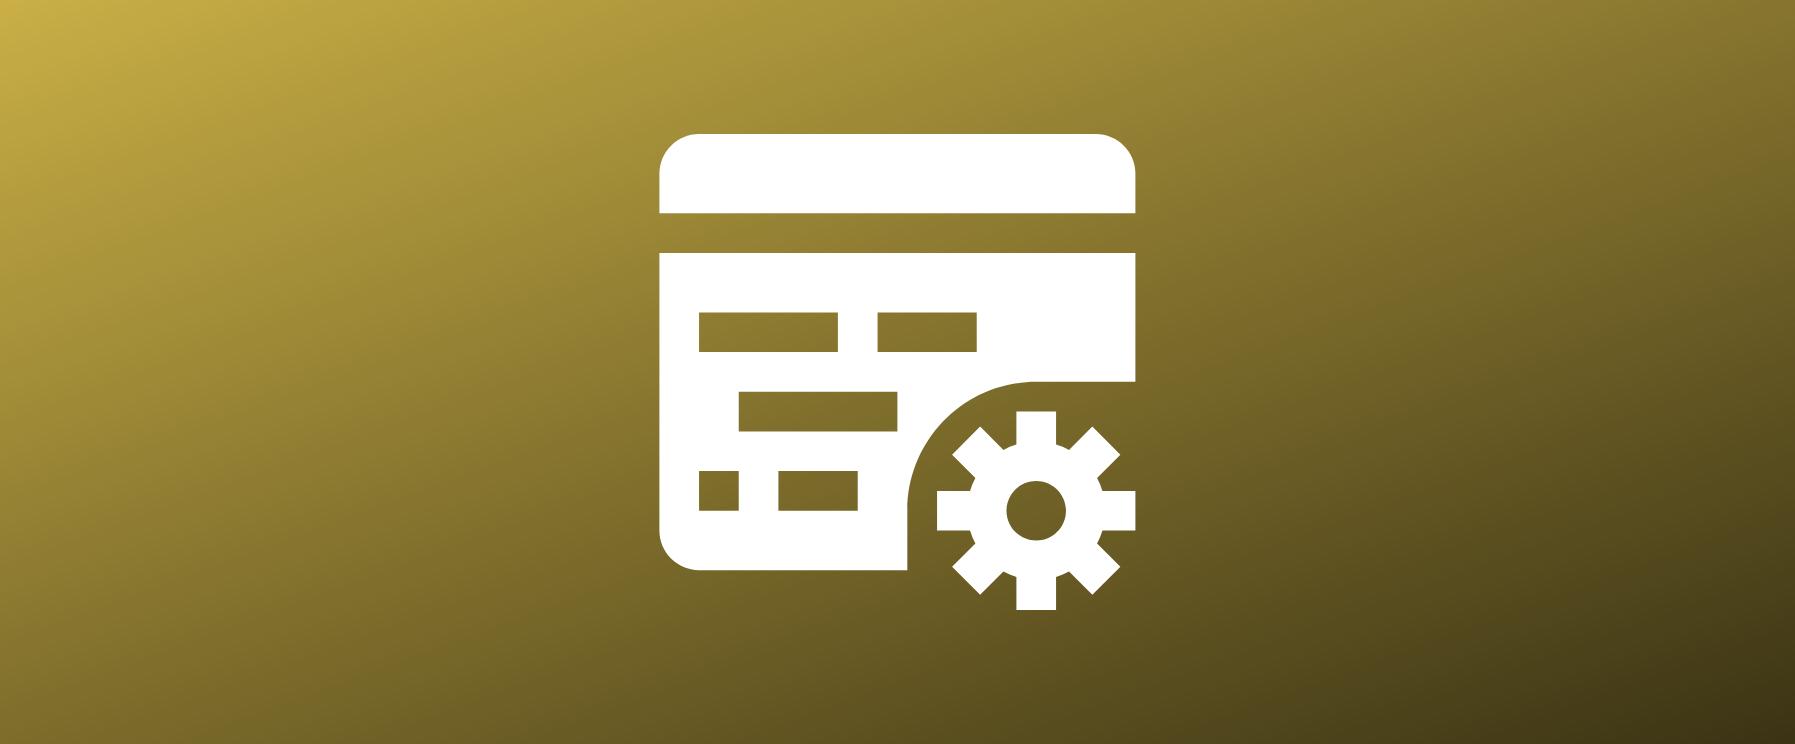 1stream settings control menu